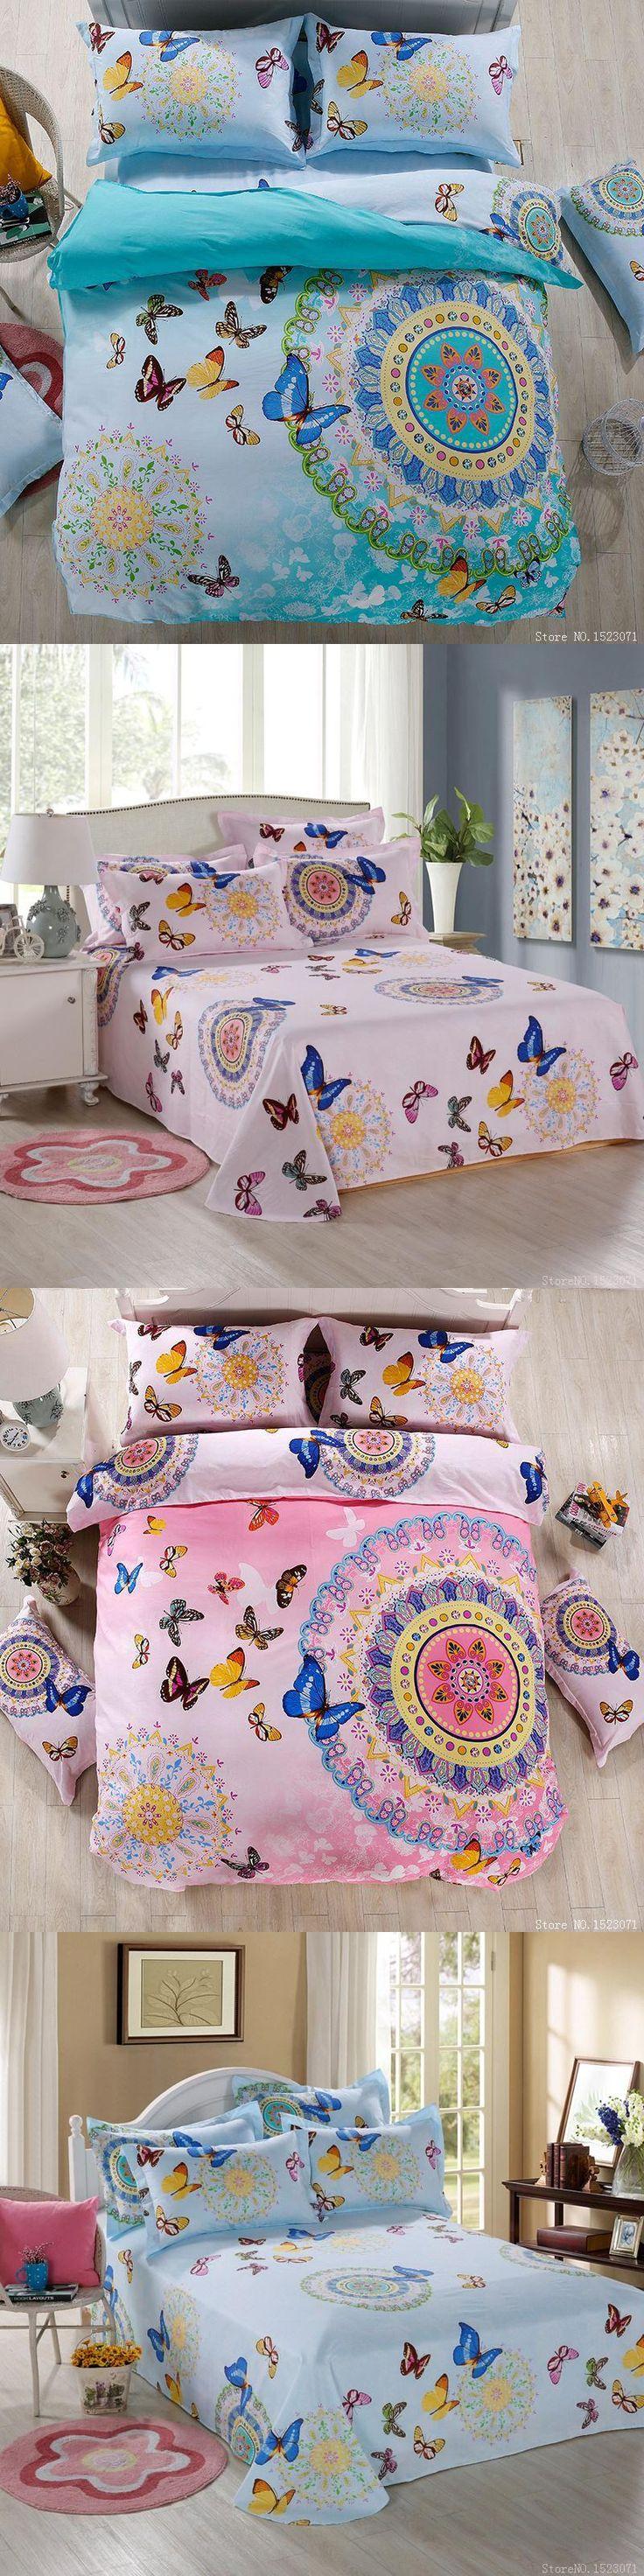 Best Butterfly bedding set ideas on Pinterest